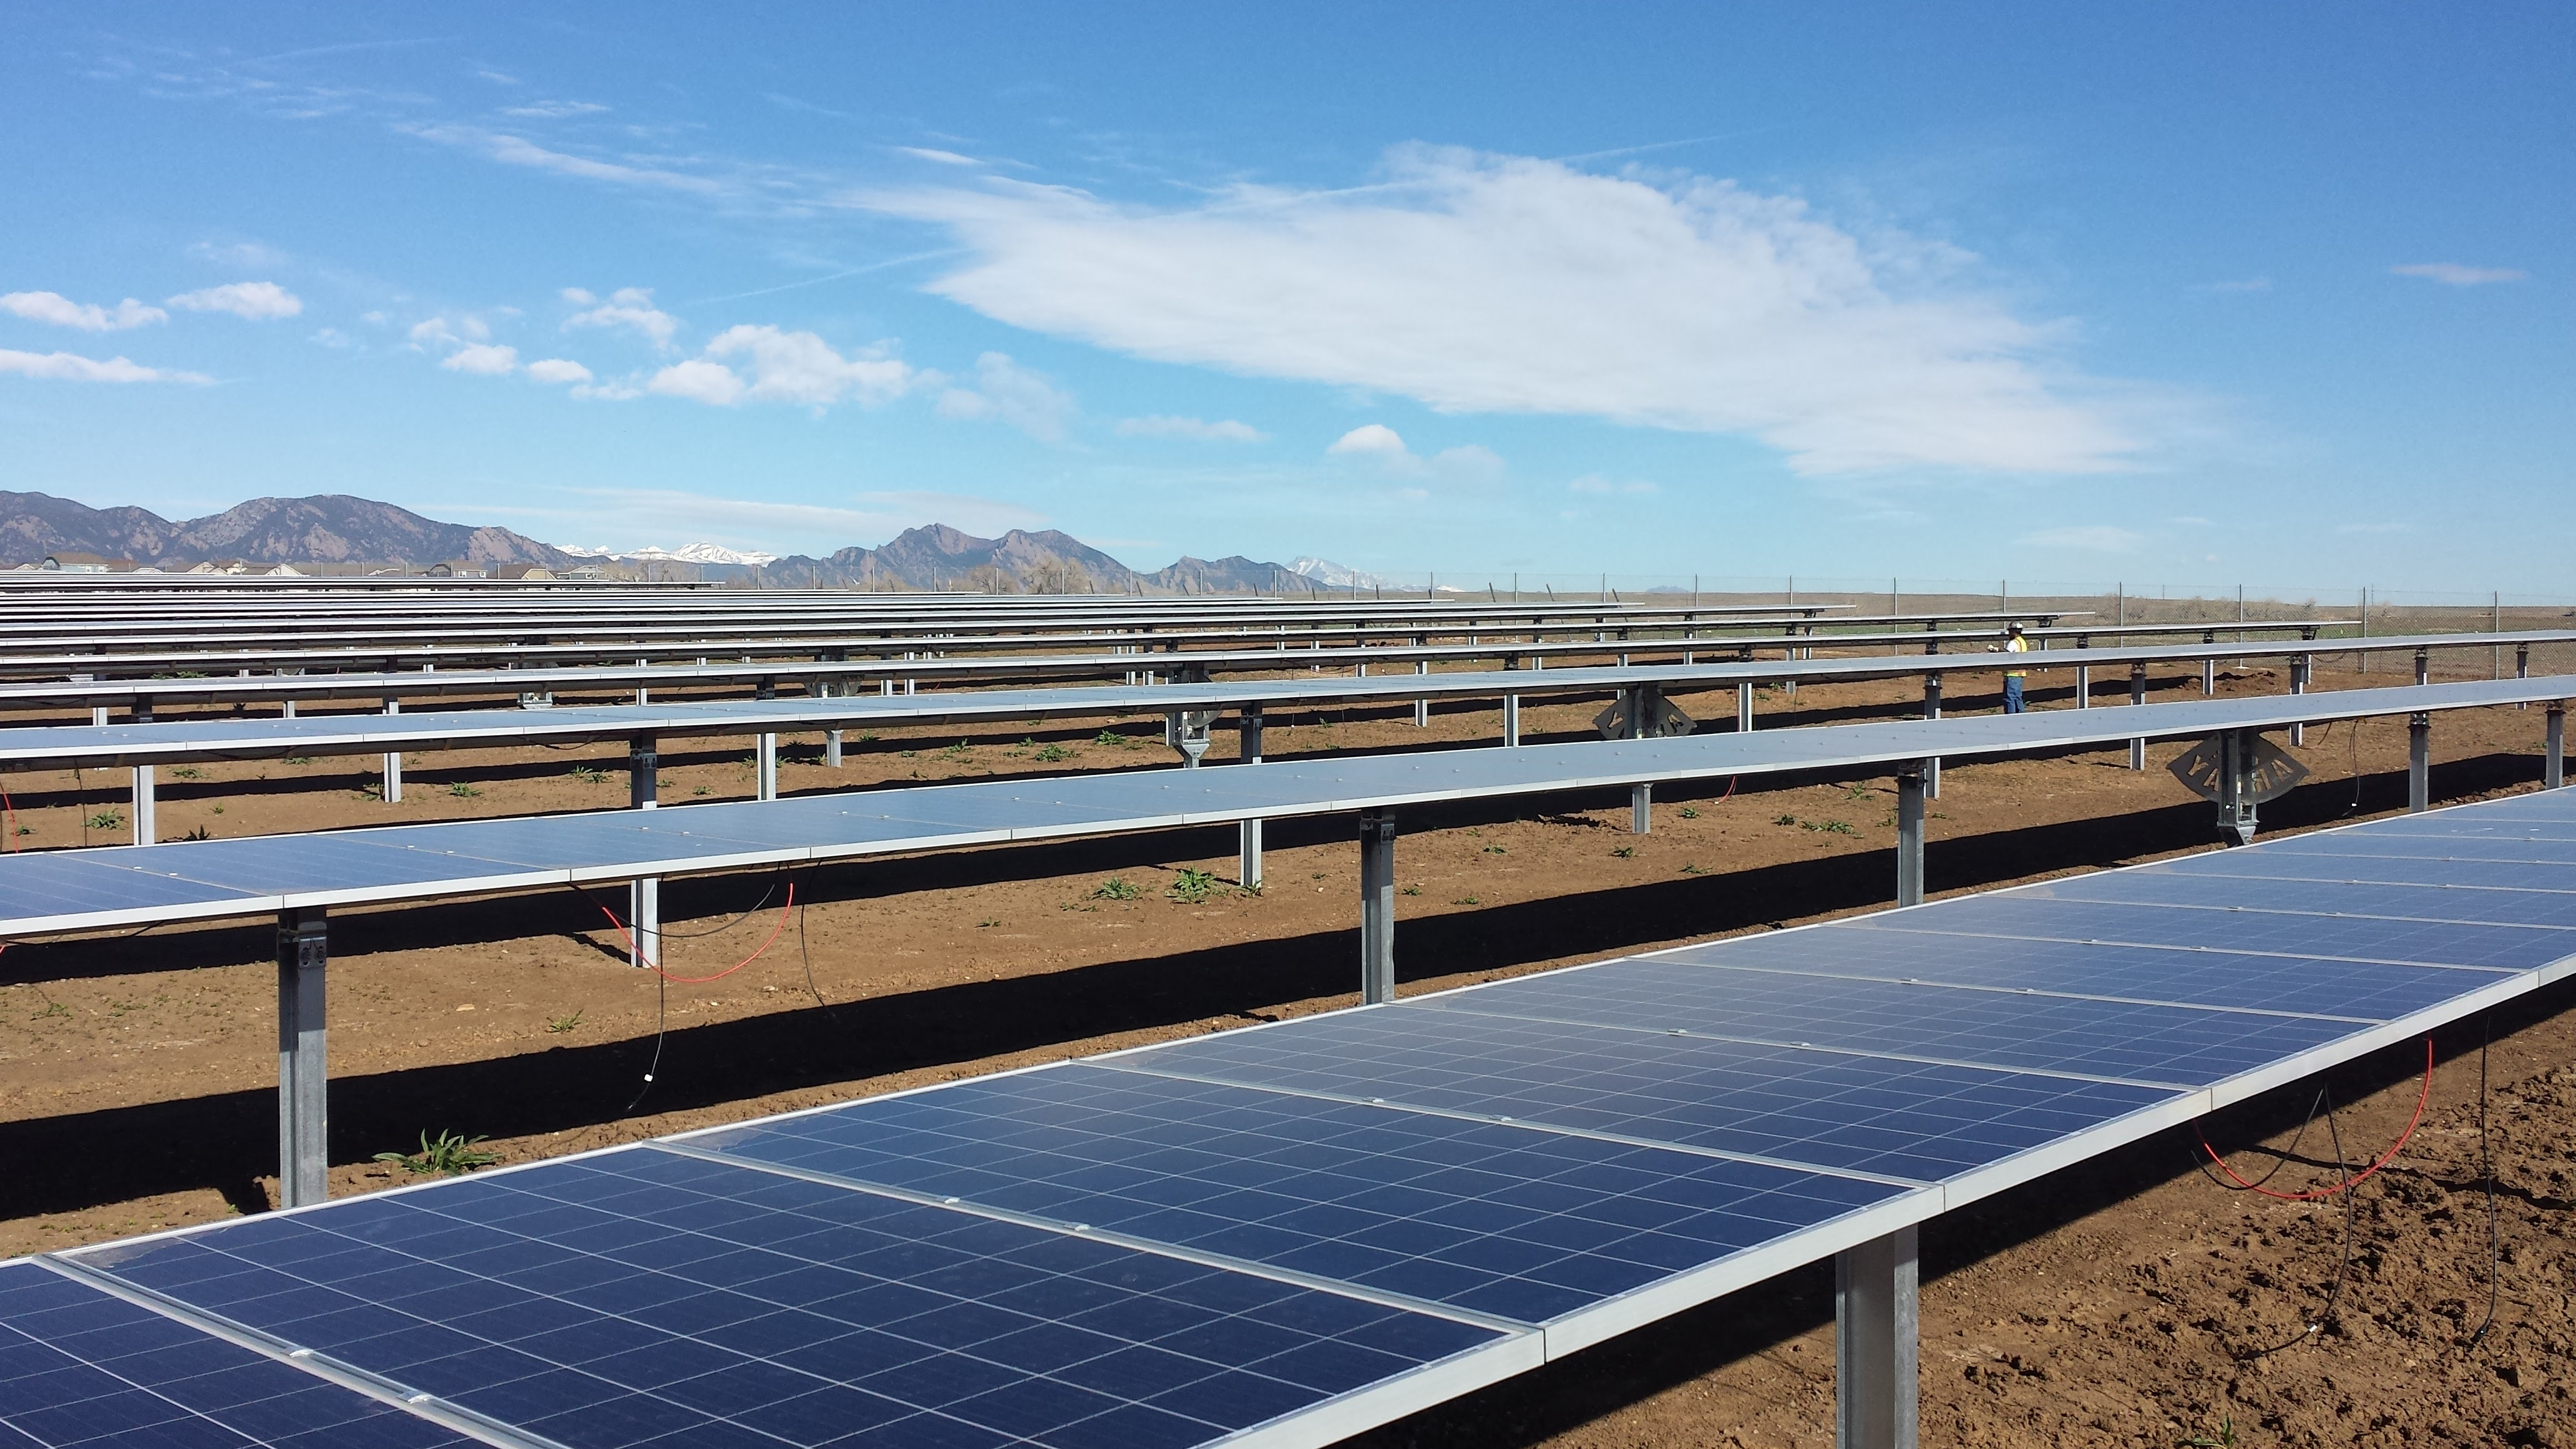 Solar panel installation moves Demonstration House closer to net zero energy